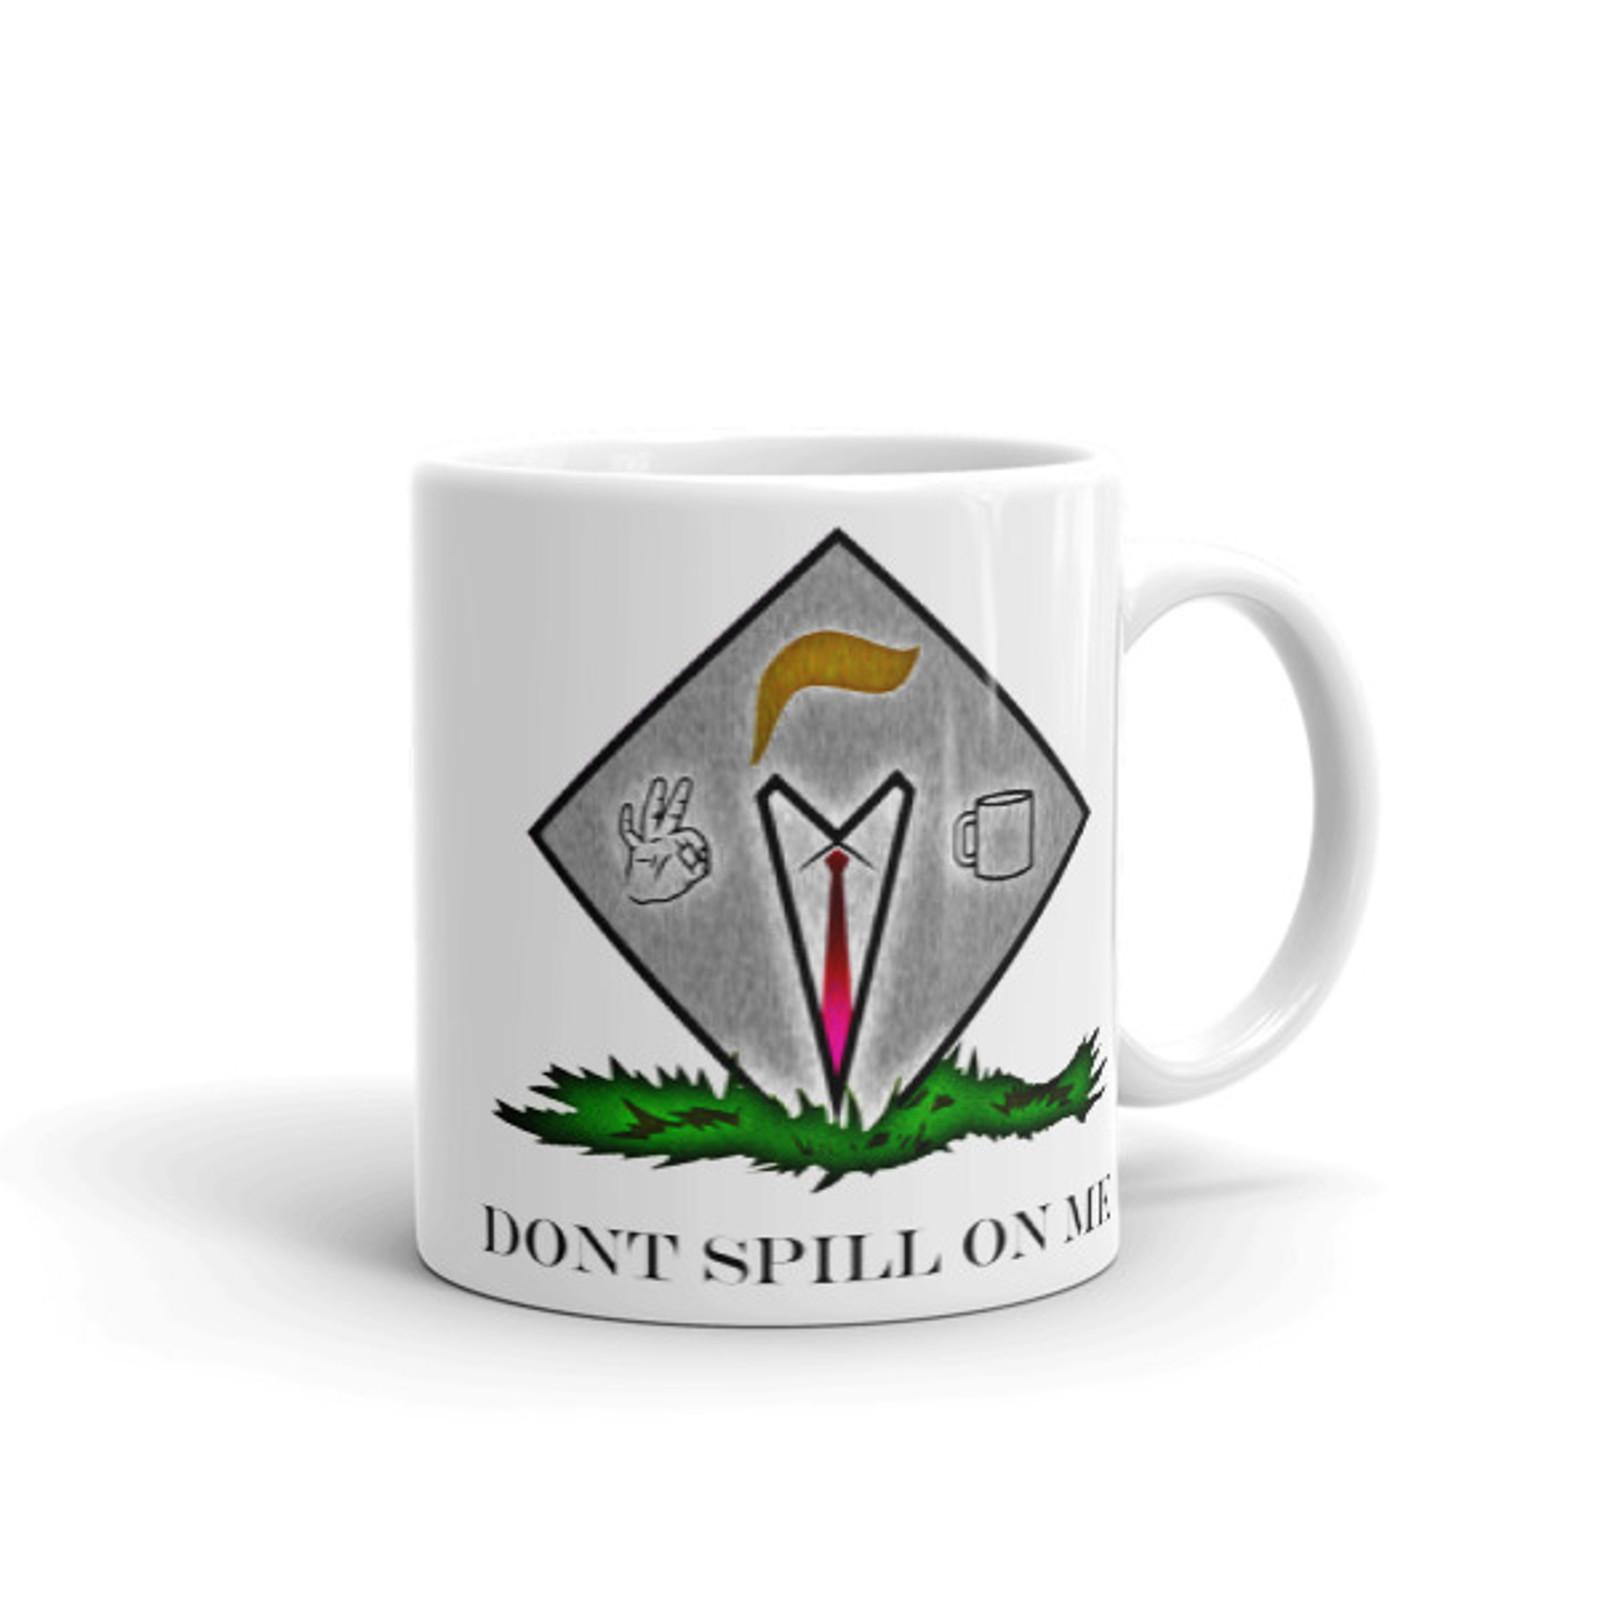 Don't Spill On Me COVFEFE Mug